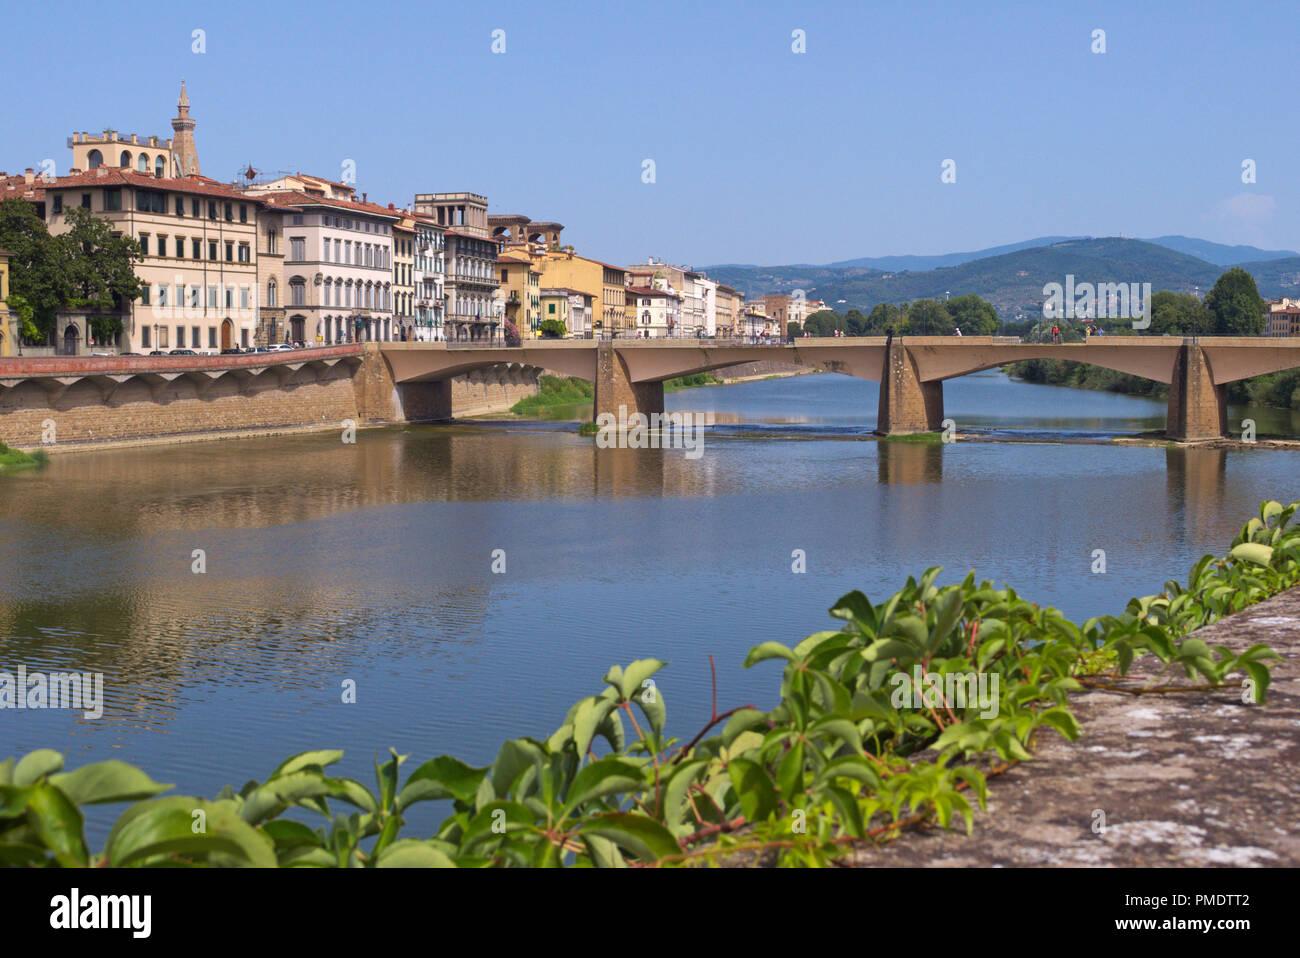 Ponte alle Grazie bridge, Florence, Italy Stock Photo